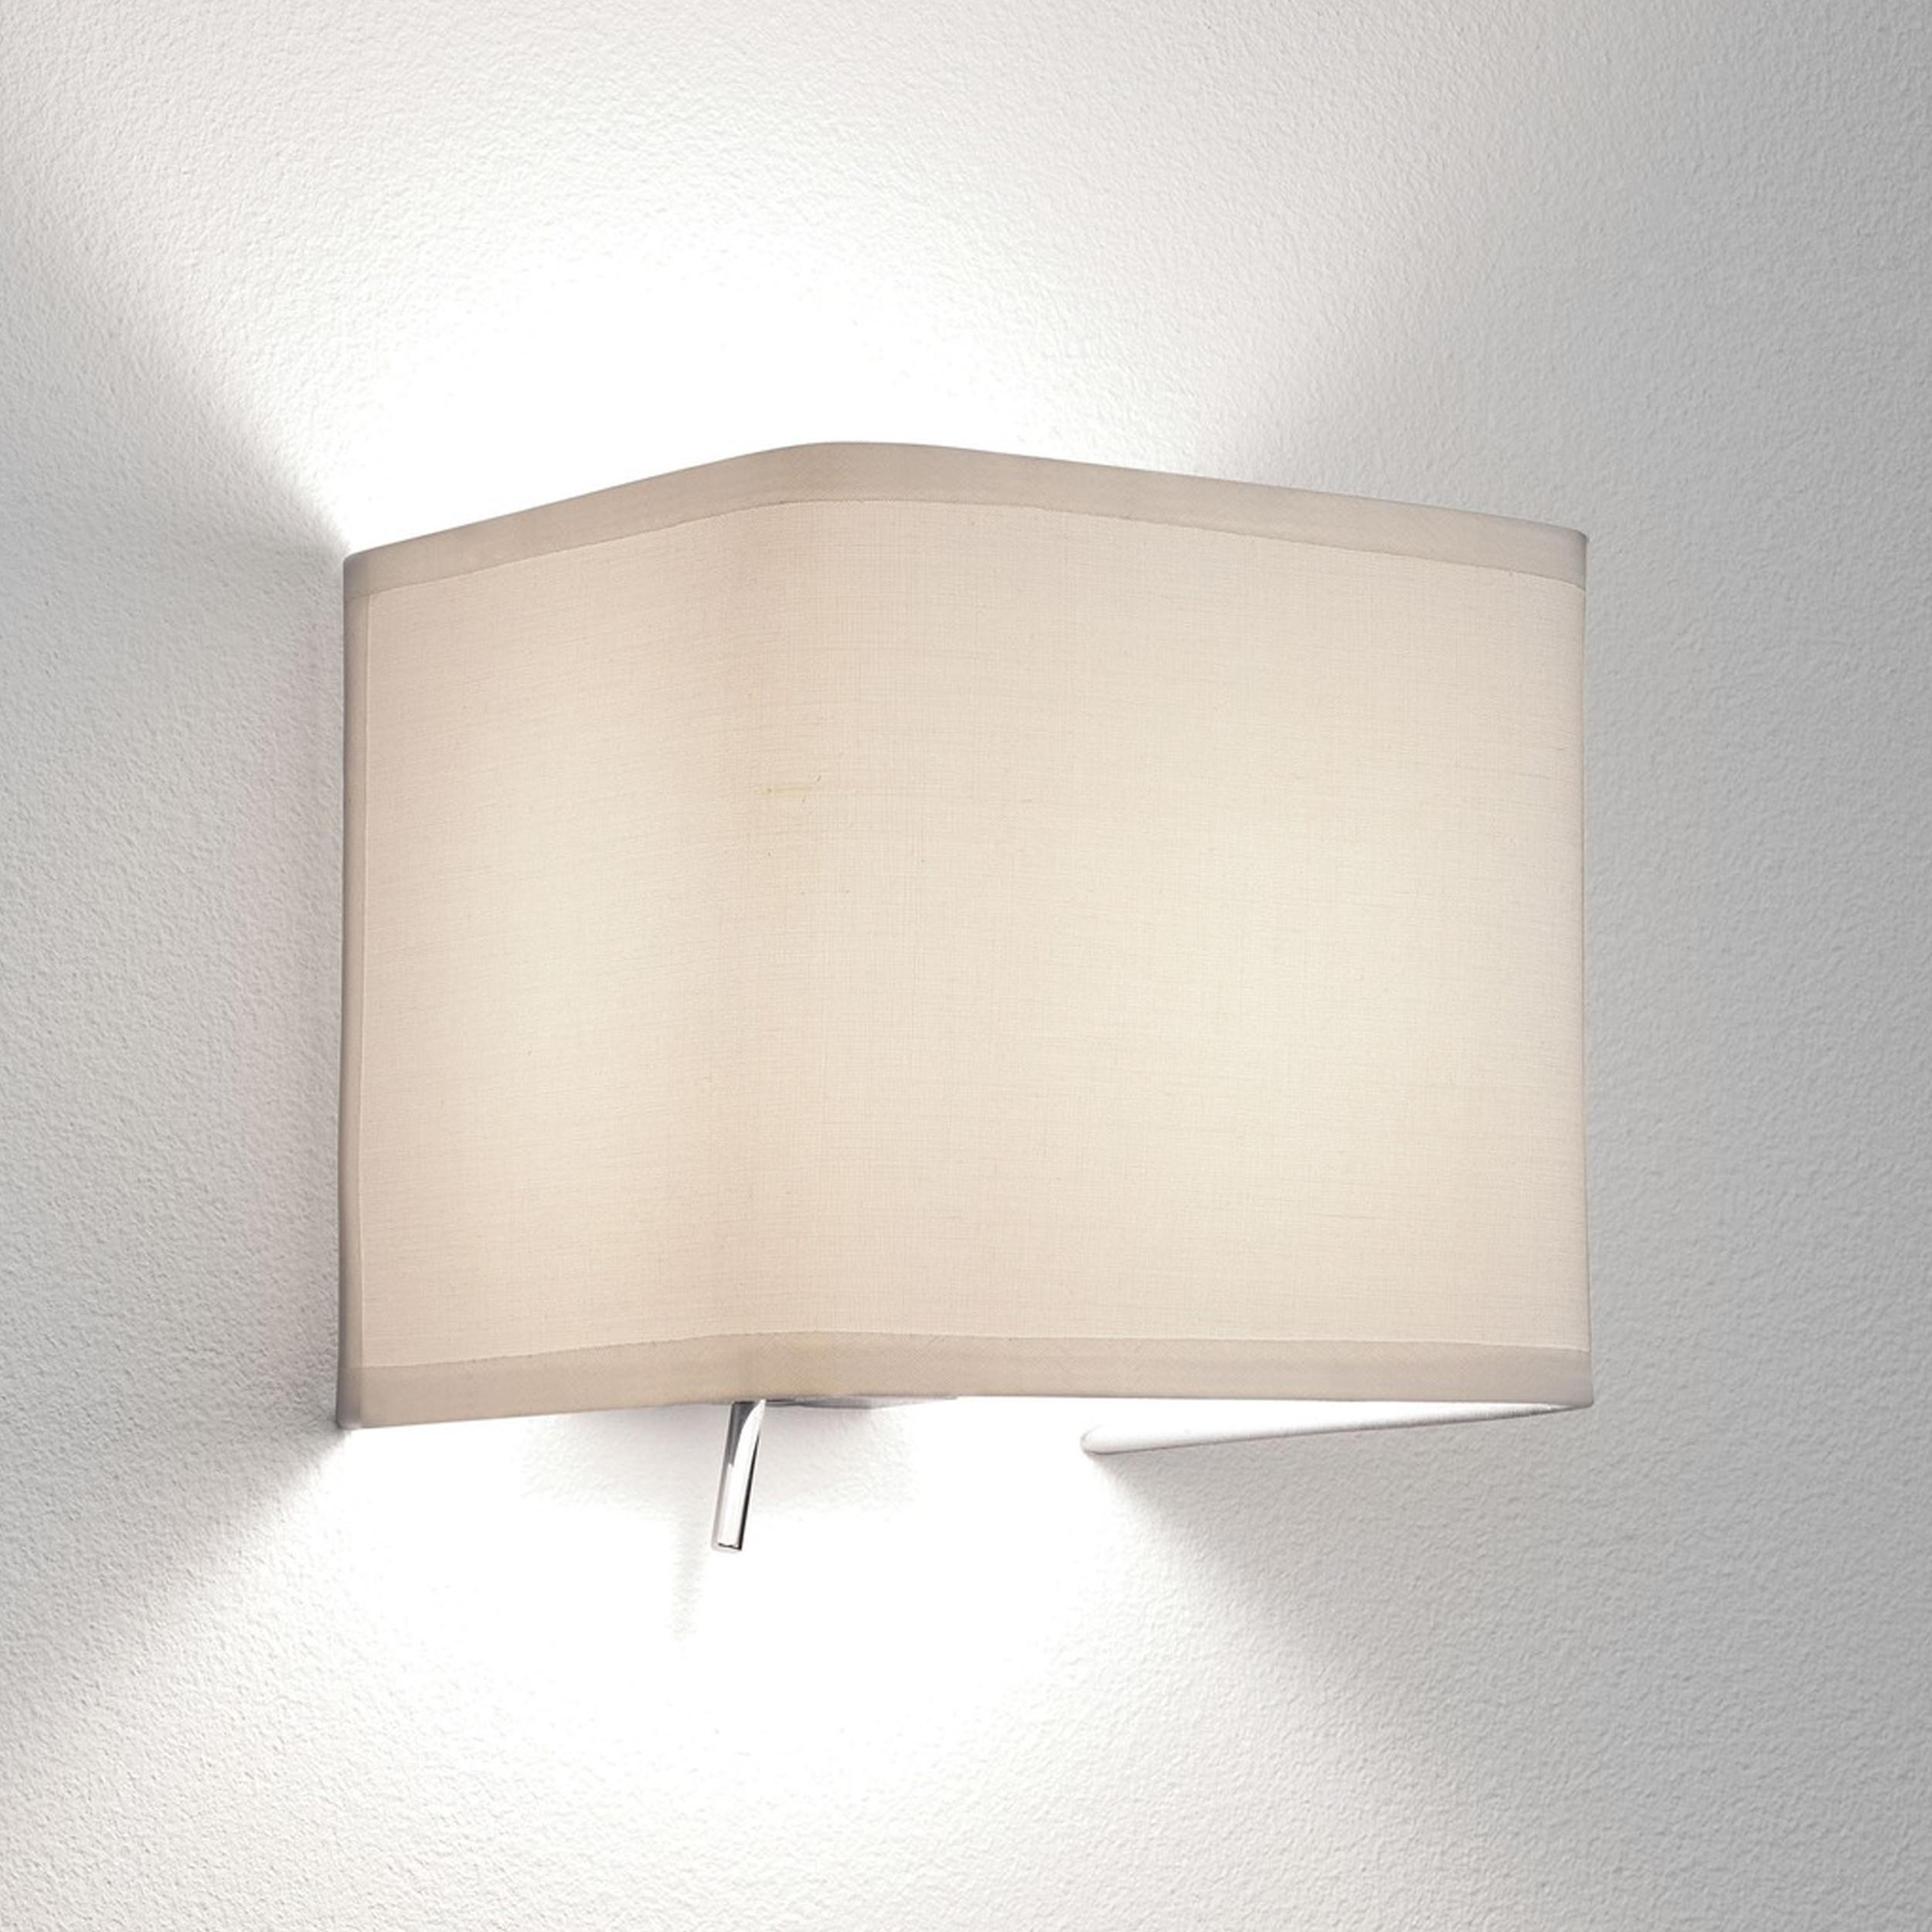 Astro Ashino Wall Light White